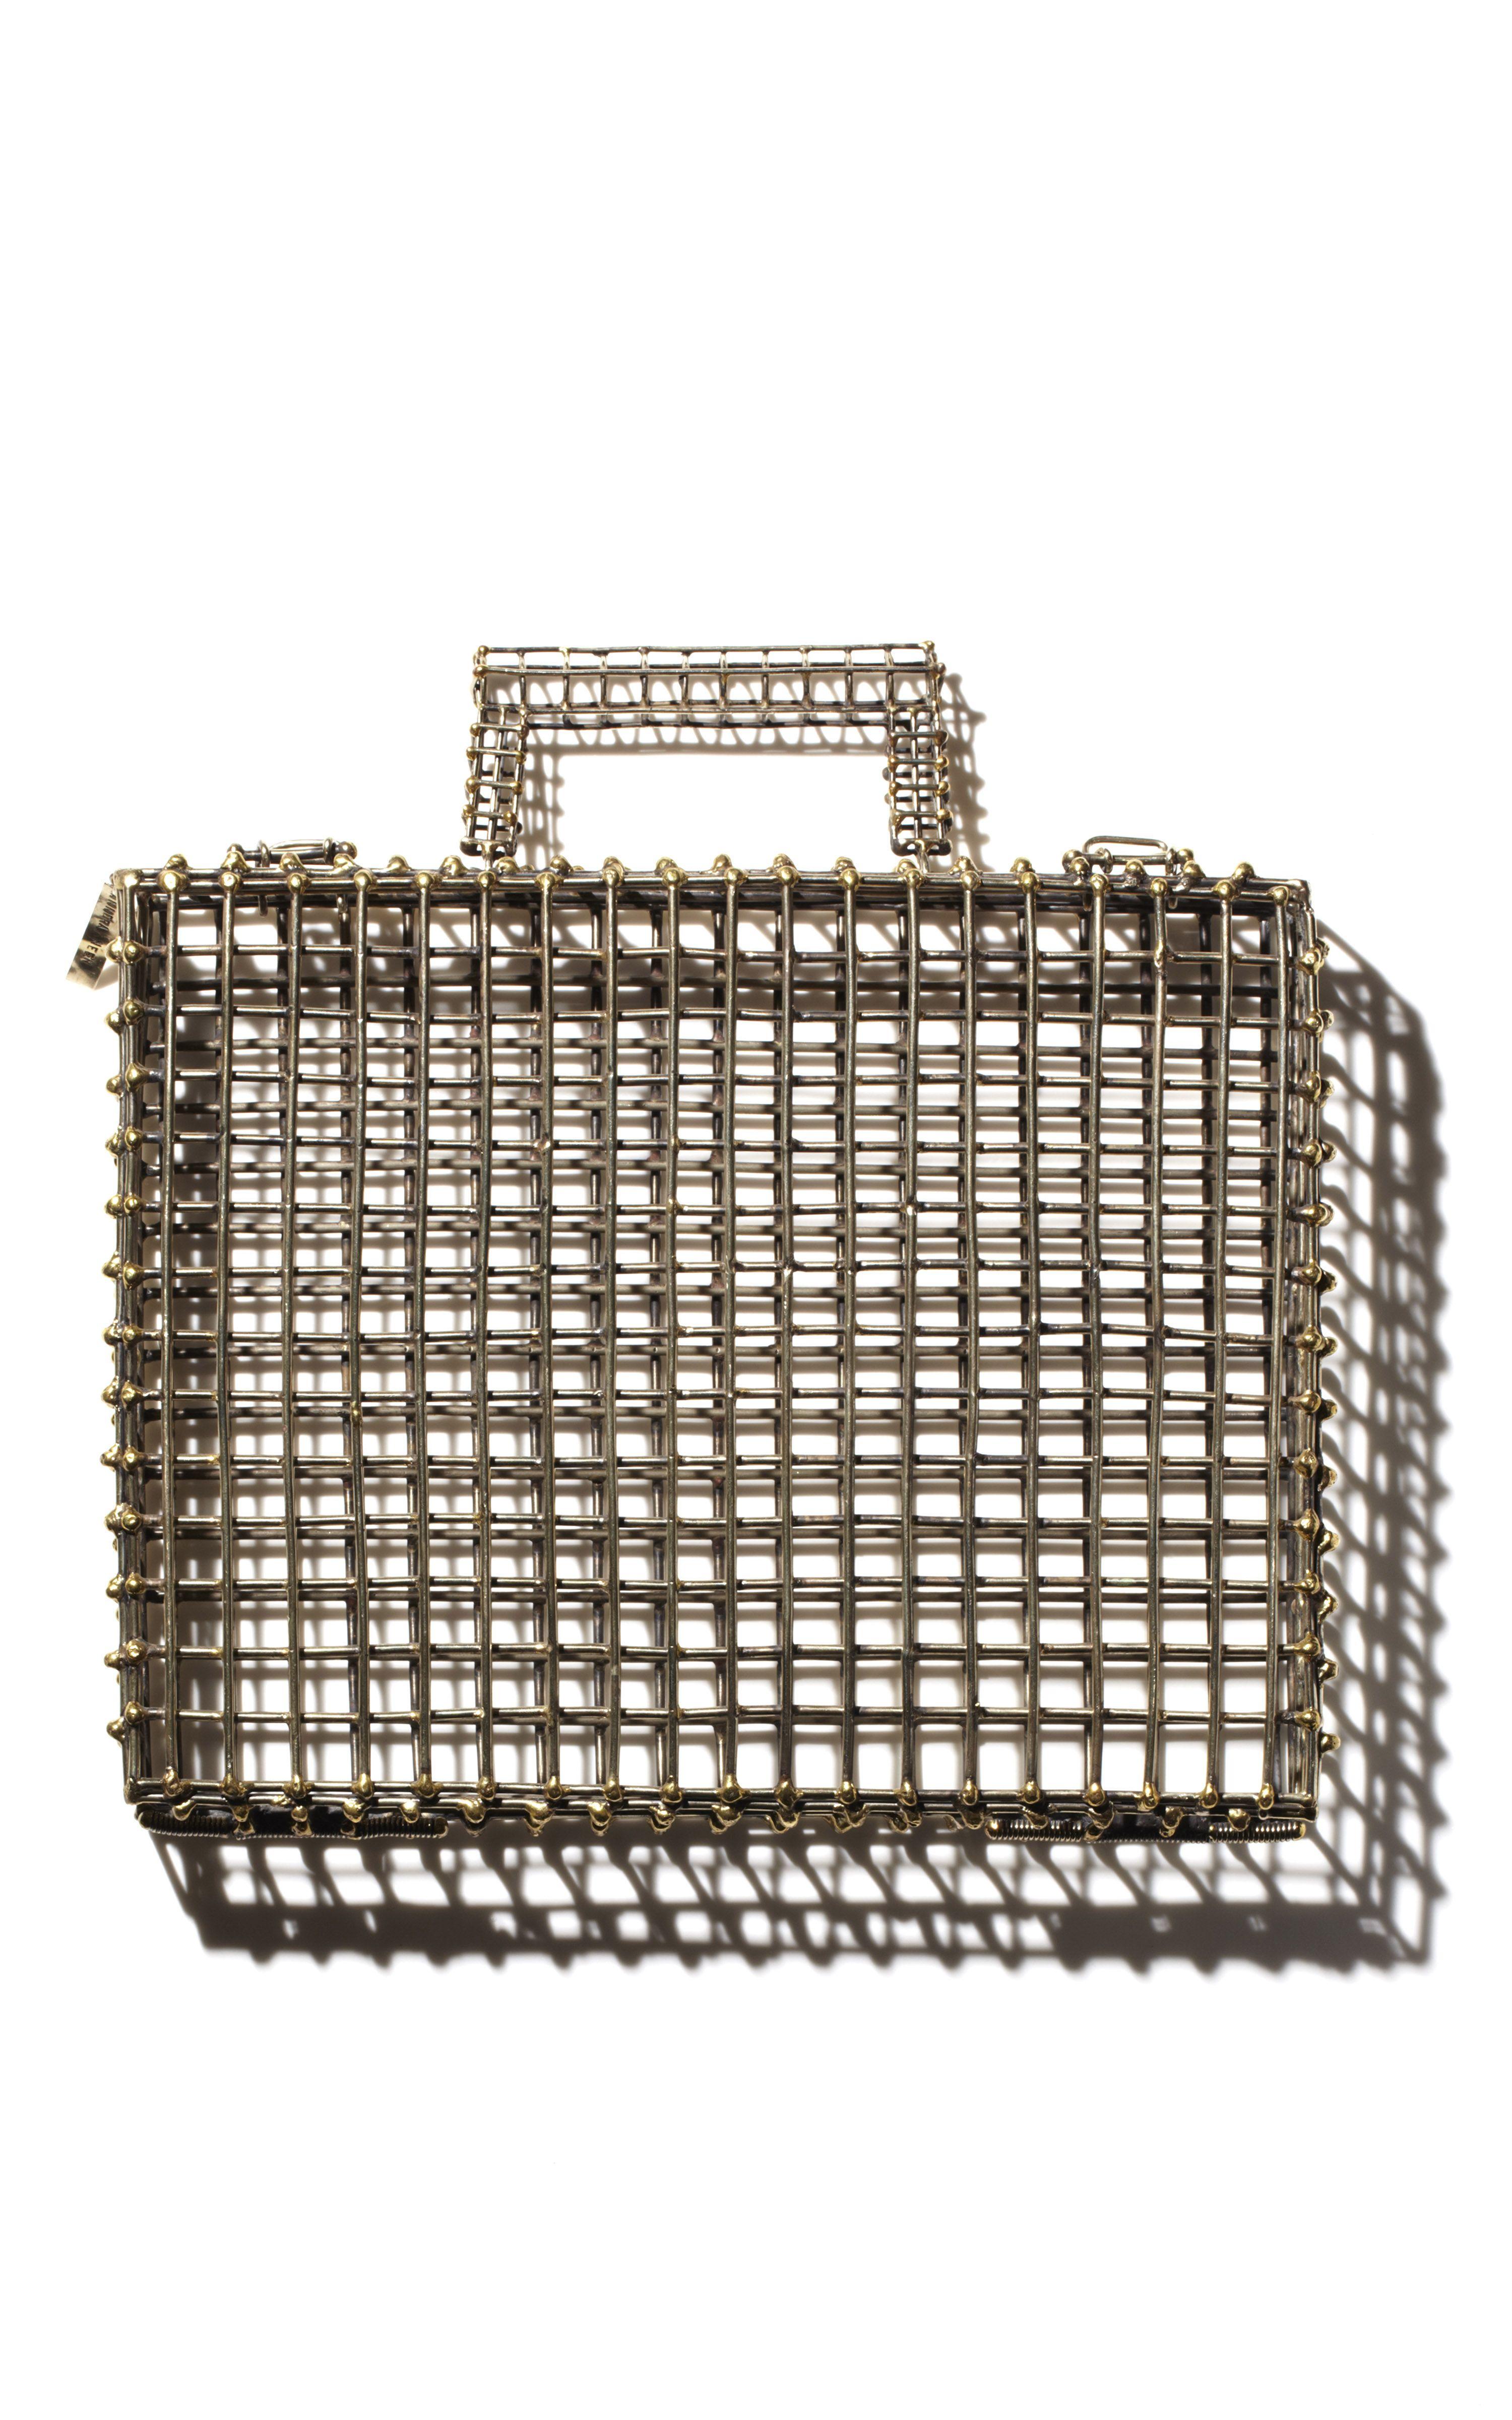 Anndra Neen : Metal Cage iPad Case  USD1,150